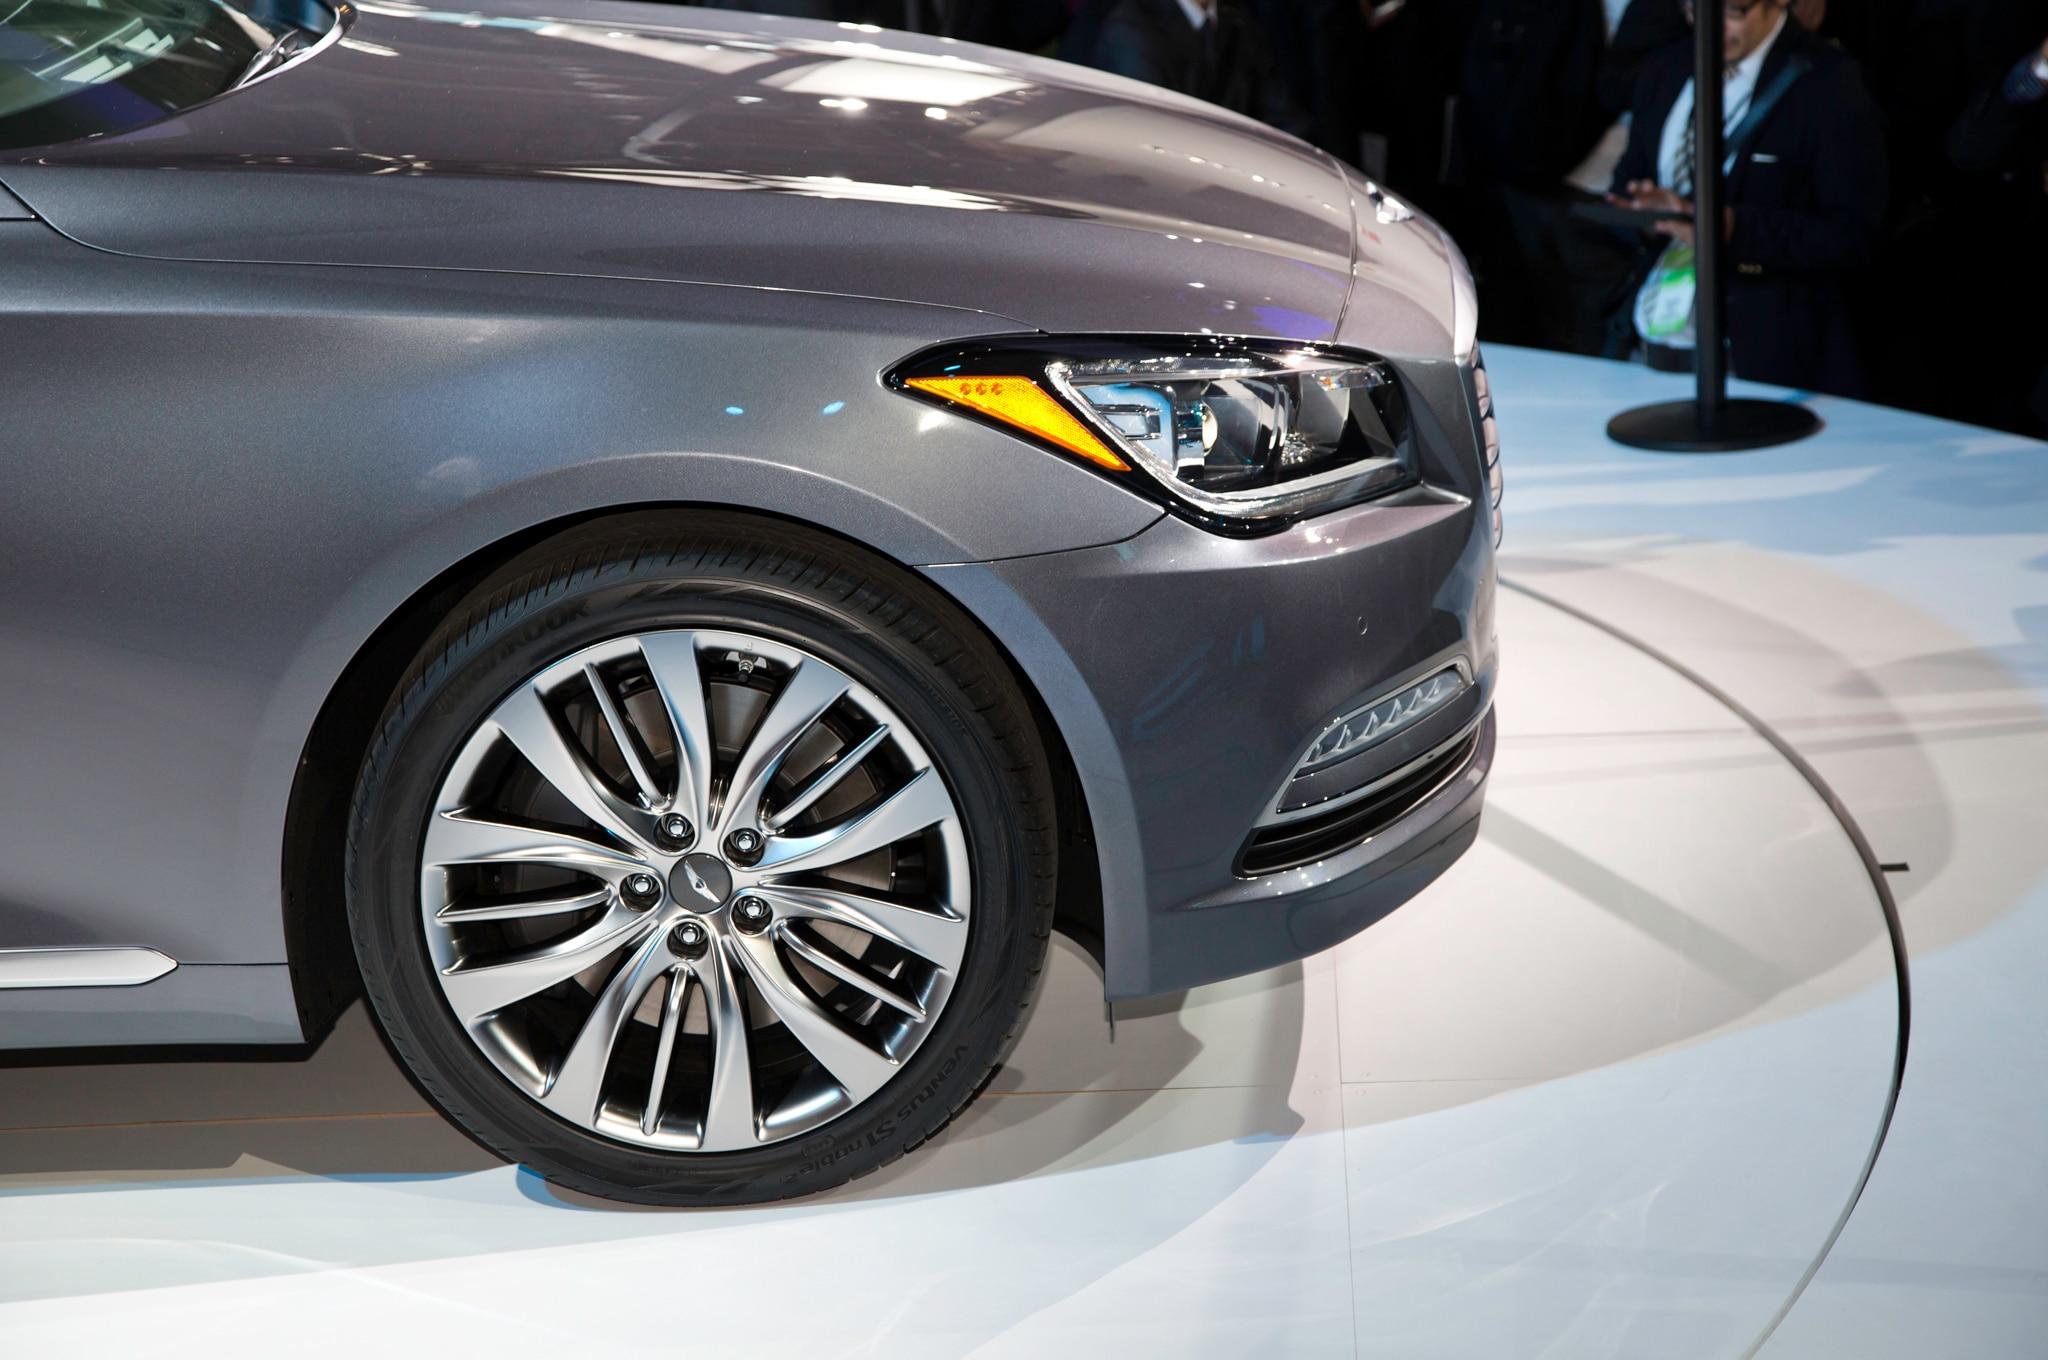 Hyundai Sonata Parts >> 2015 Hyundai Genesis Debuts At 2014 Detroit Auto Show - Automobile Magazine